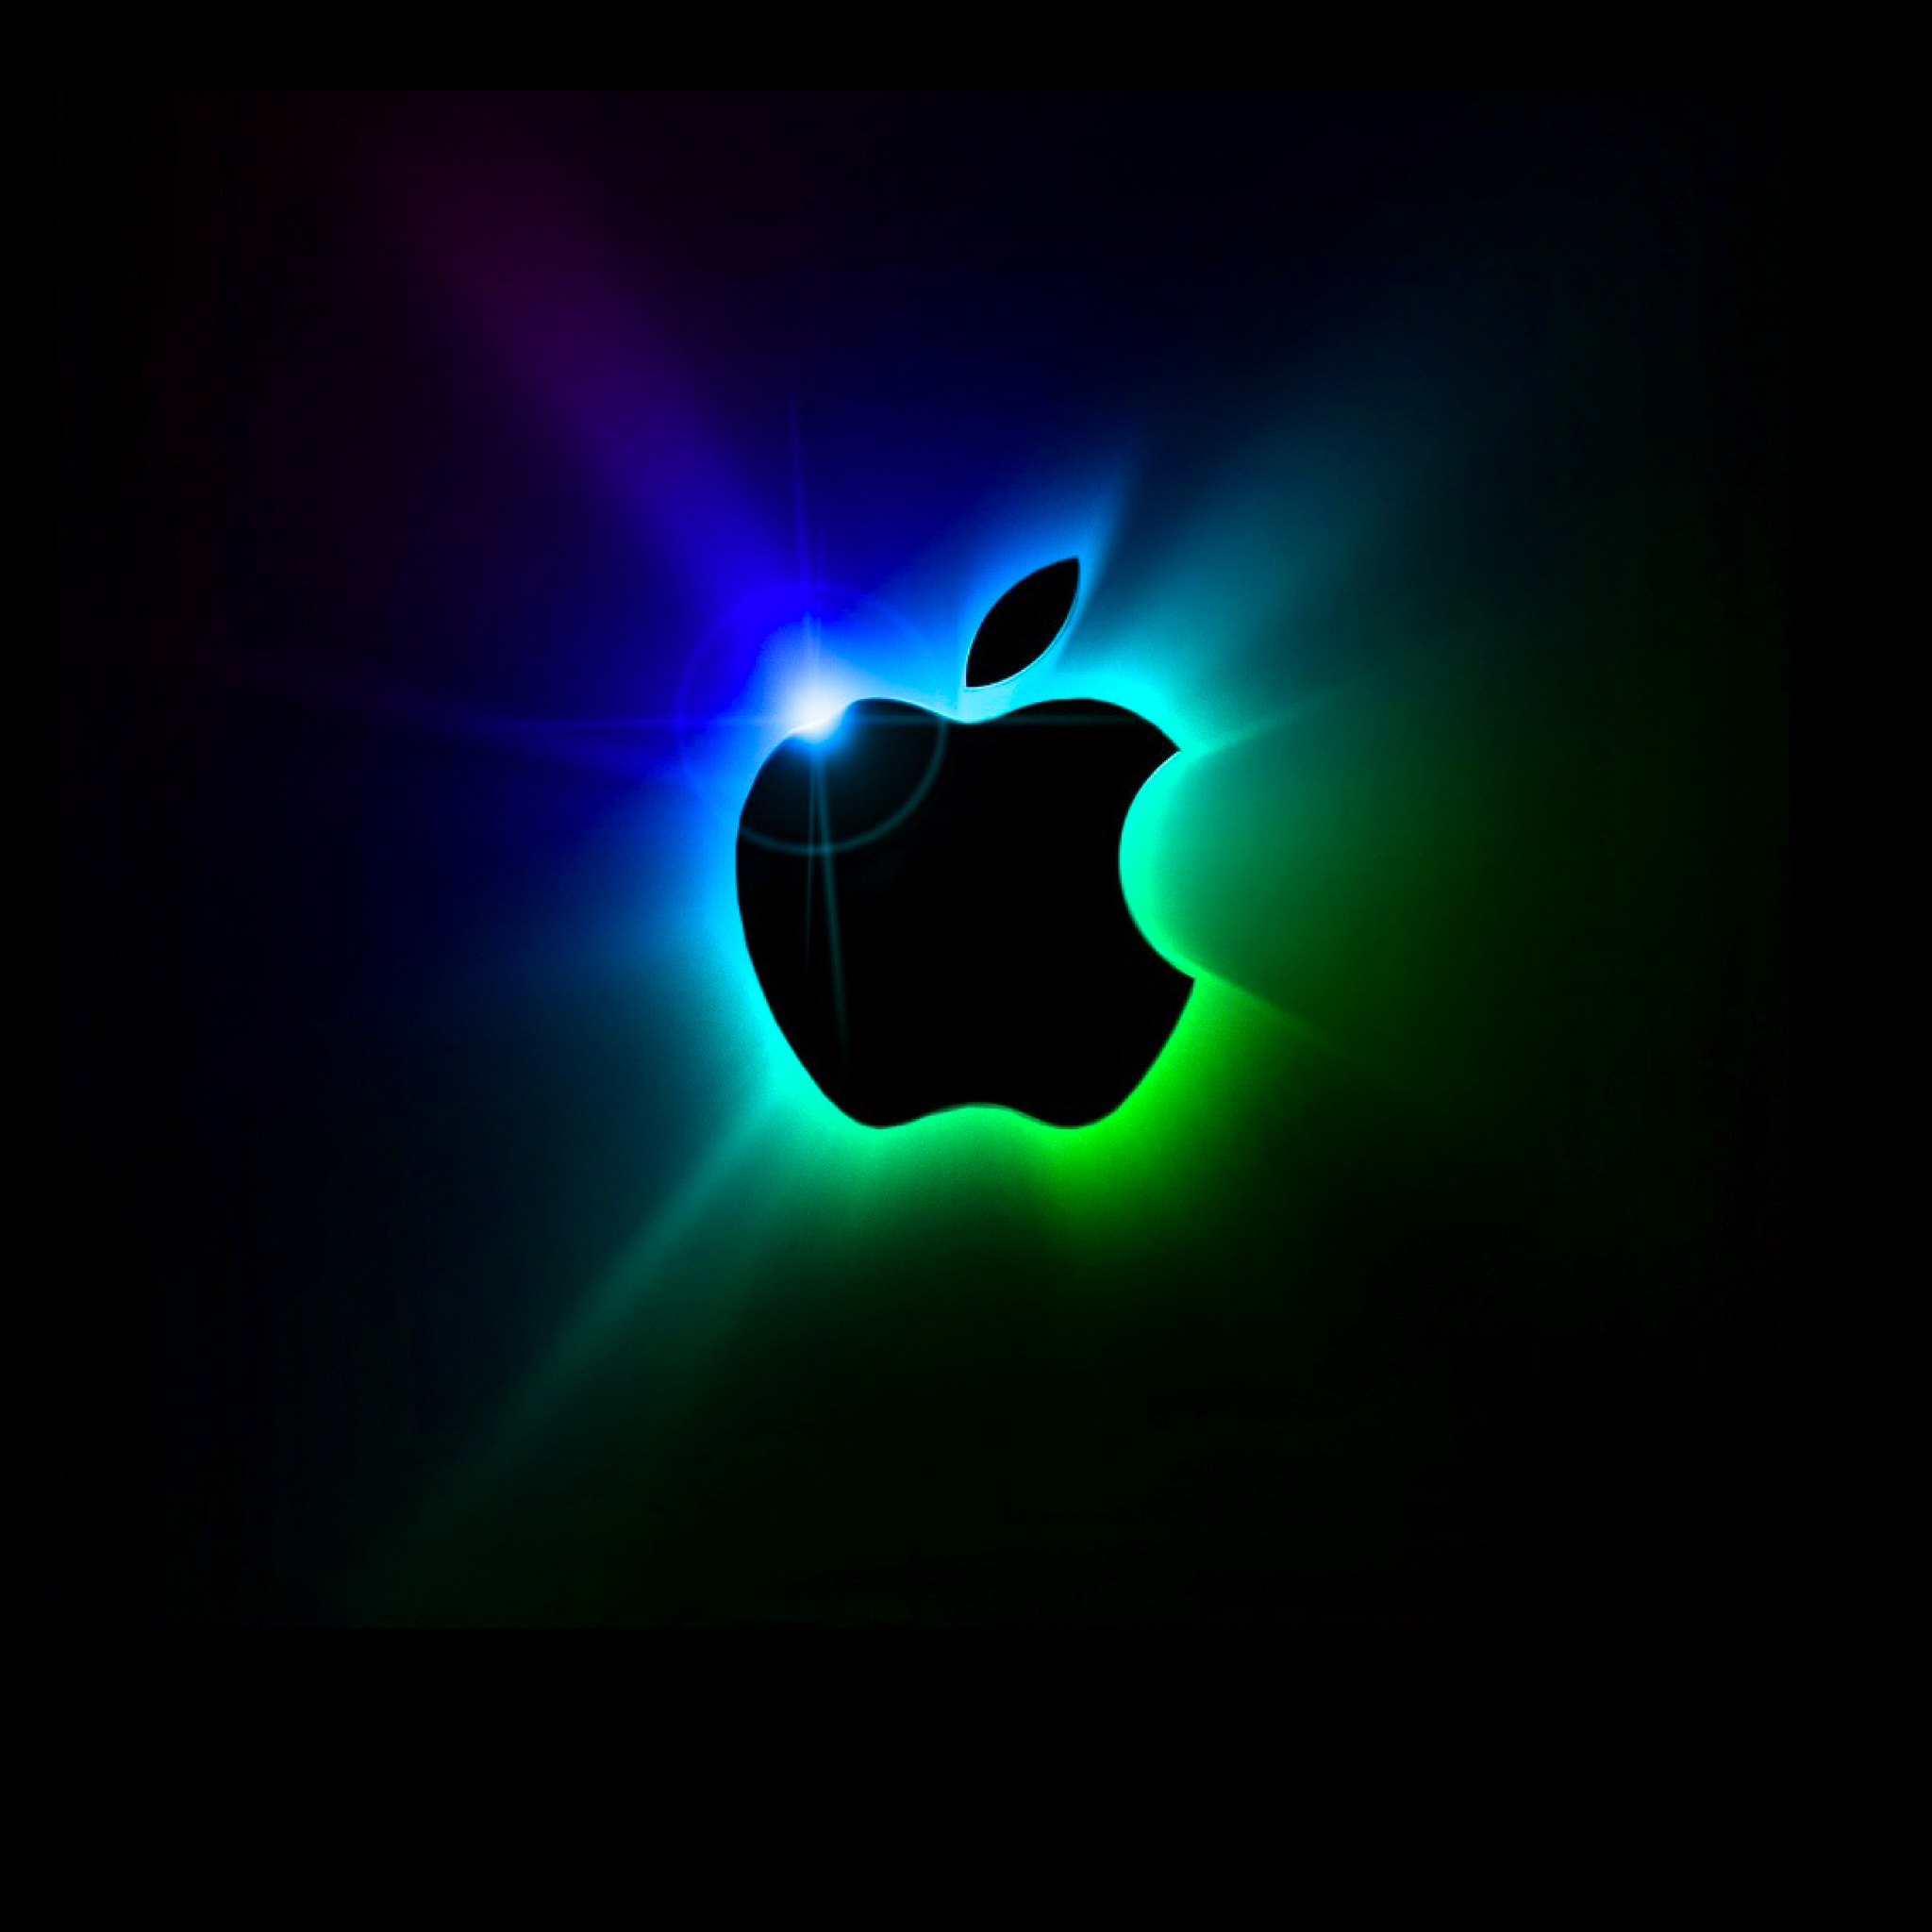 Крутые картинки айфона яблоко